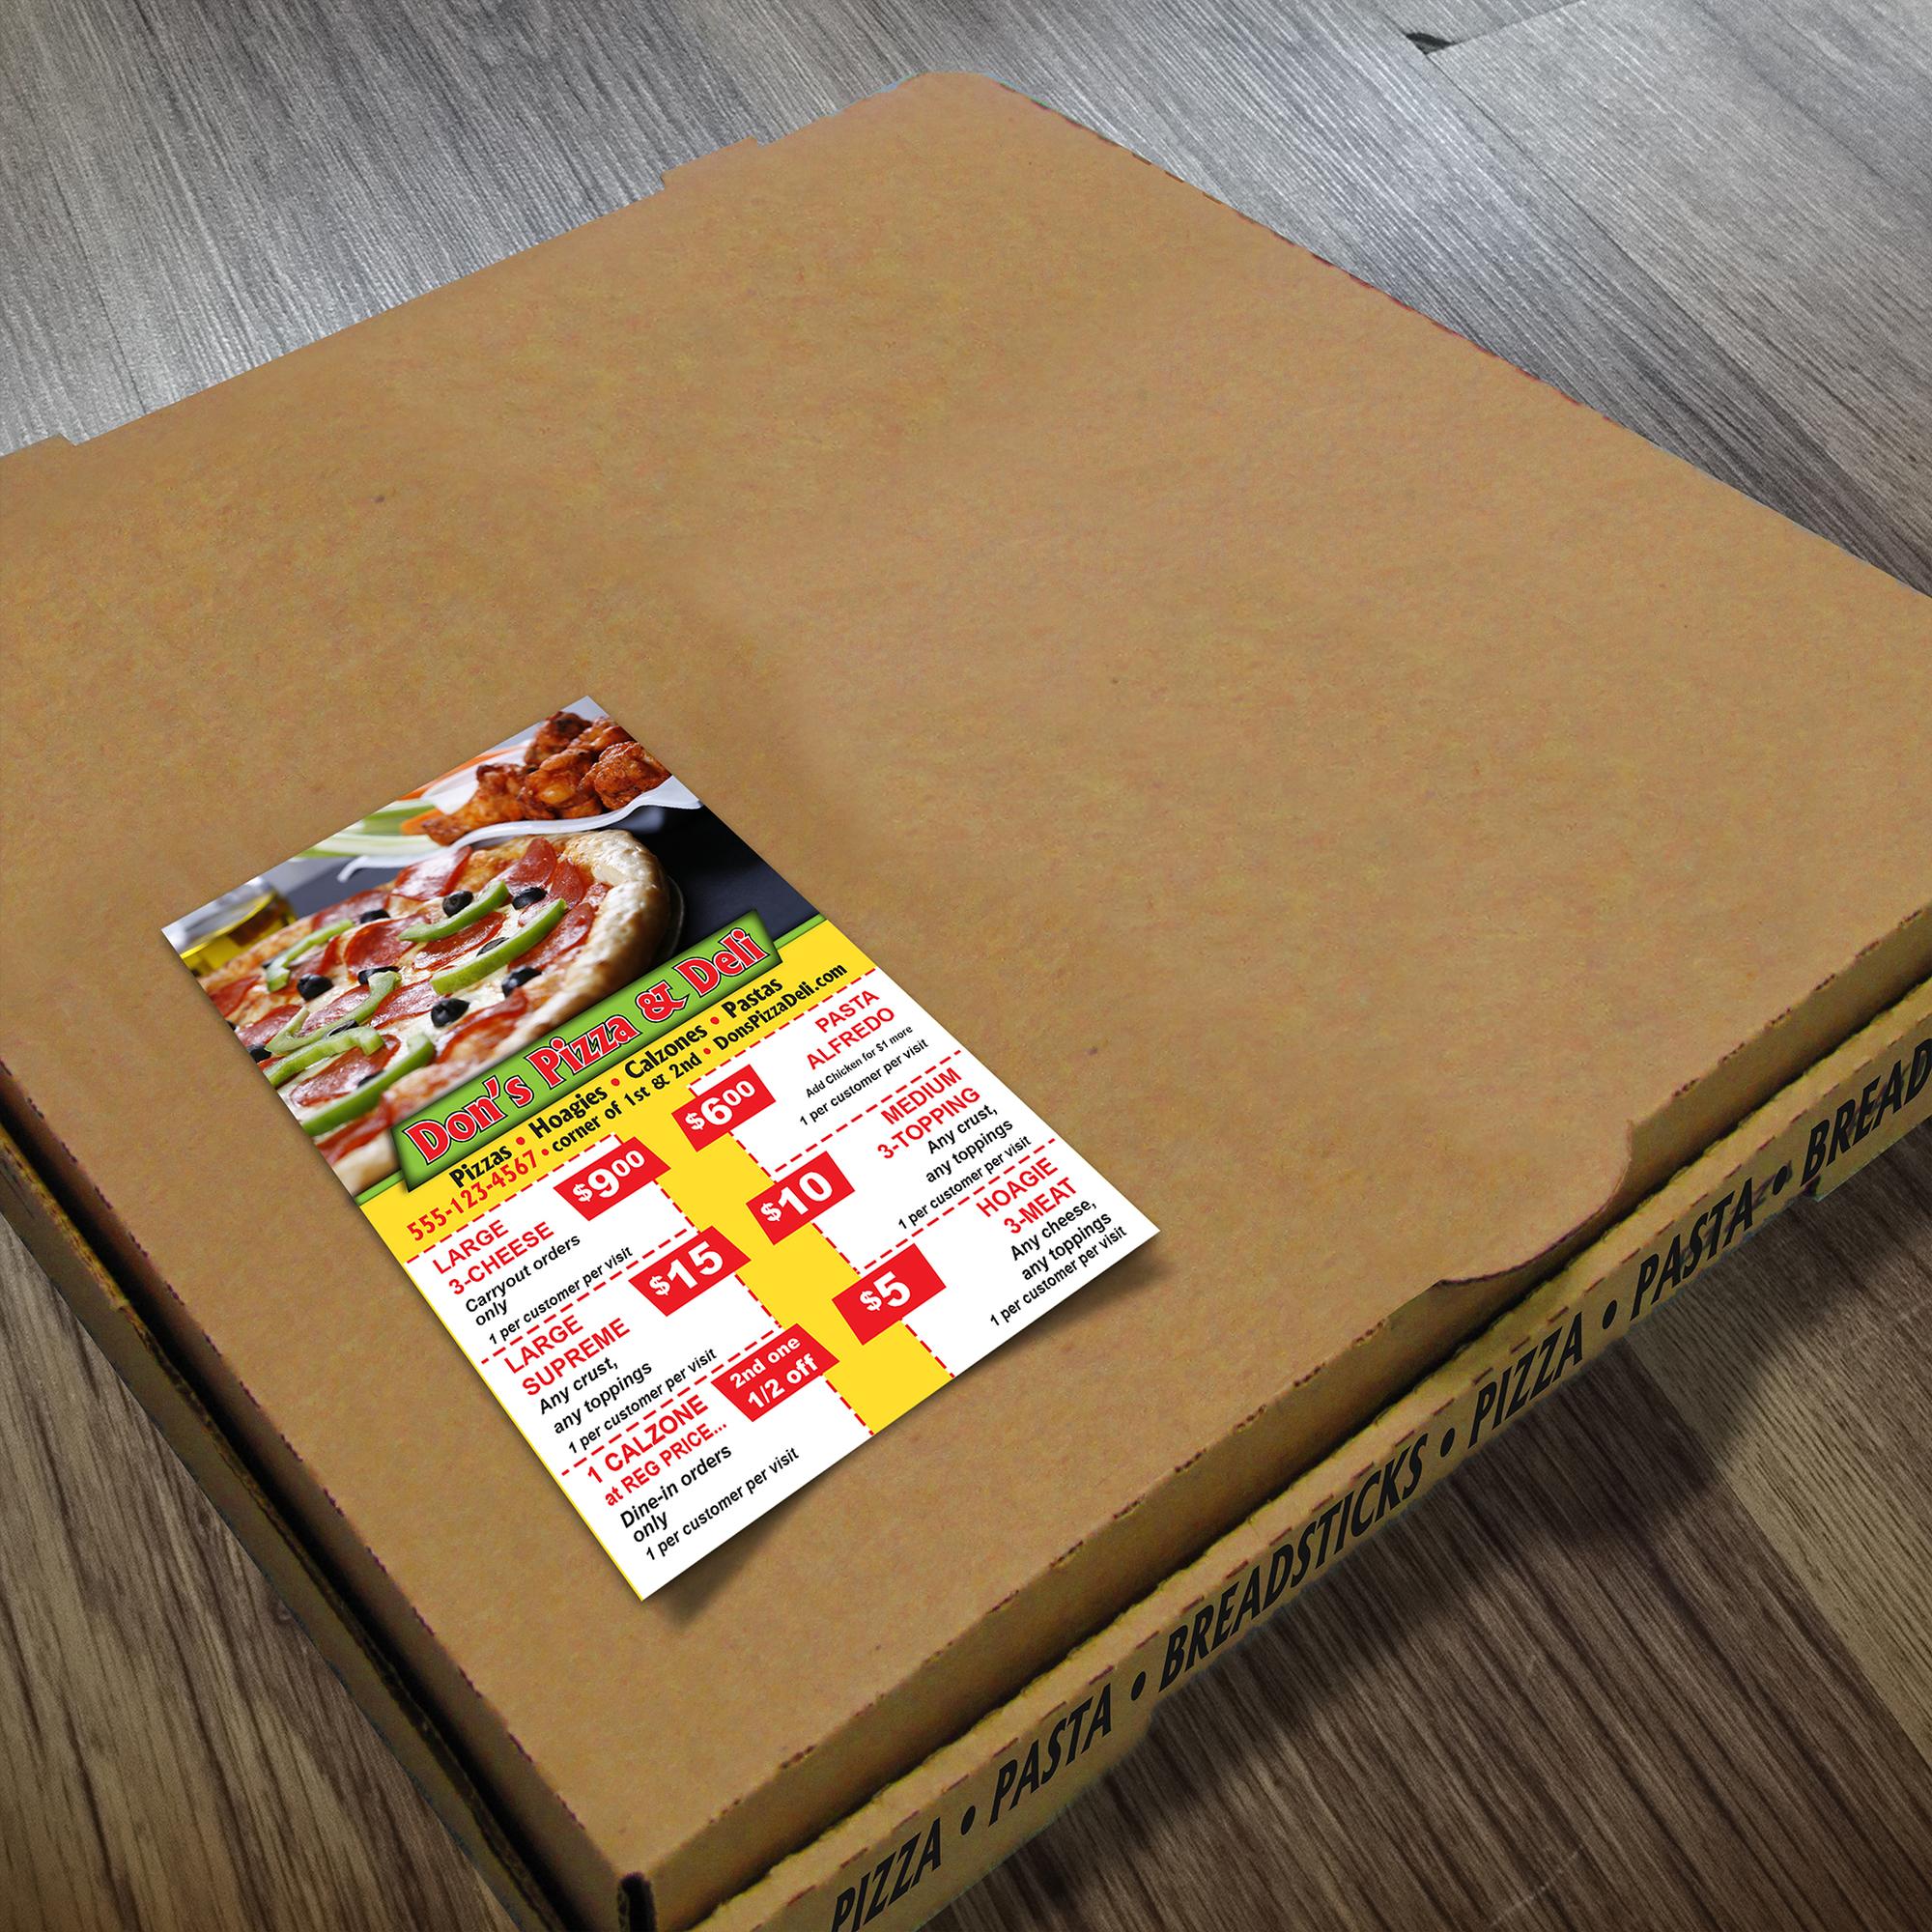 Boxtopper on pizza box